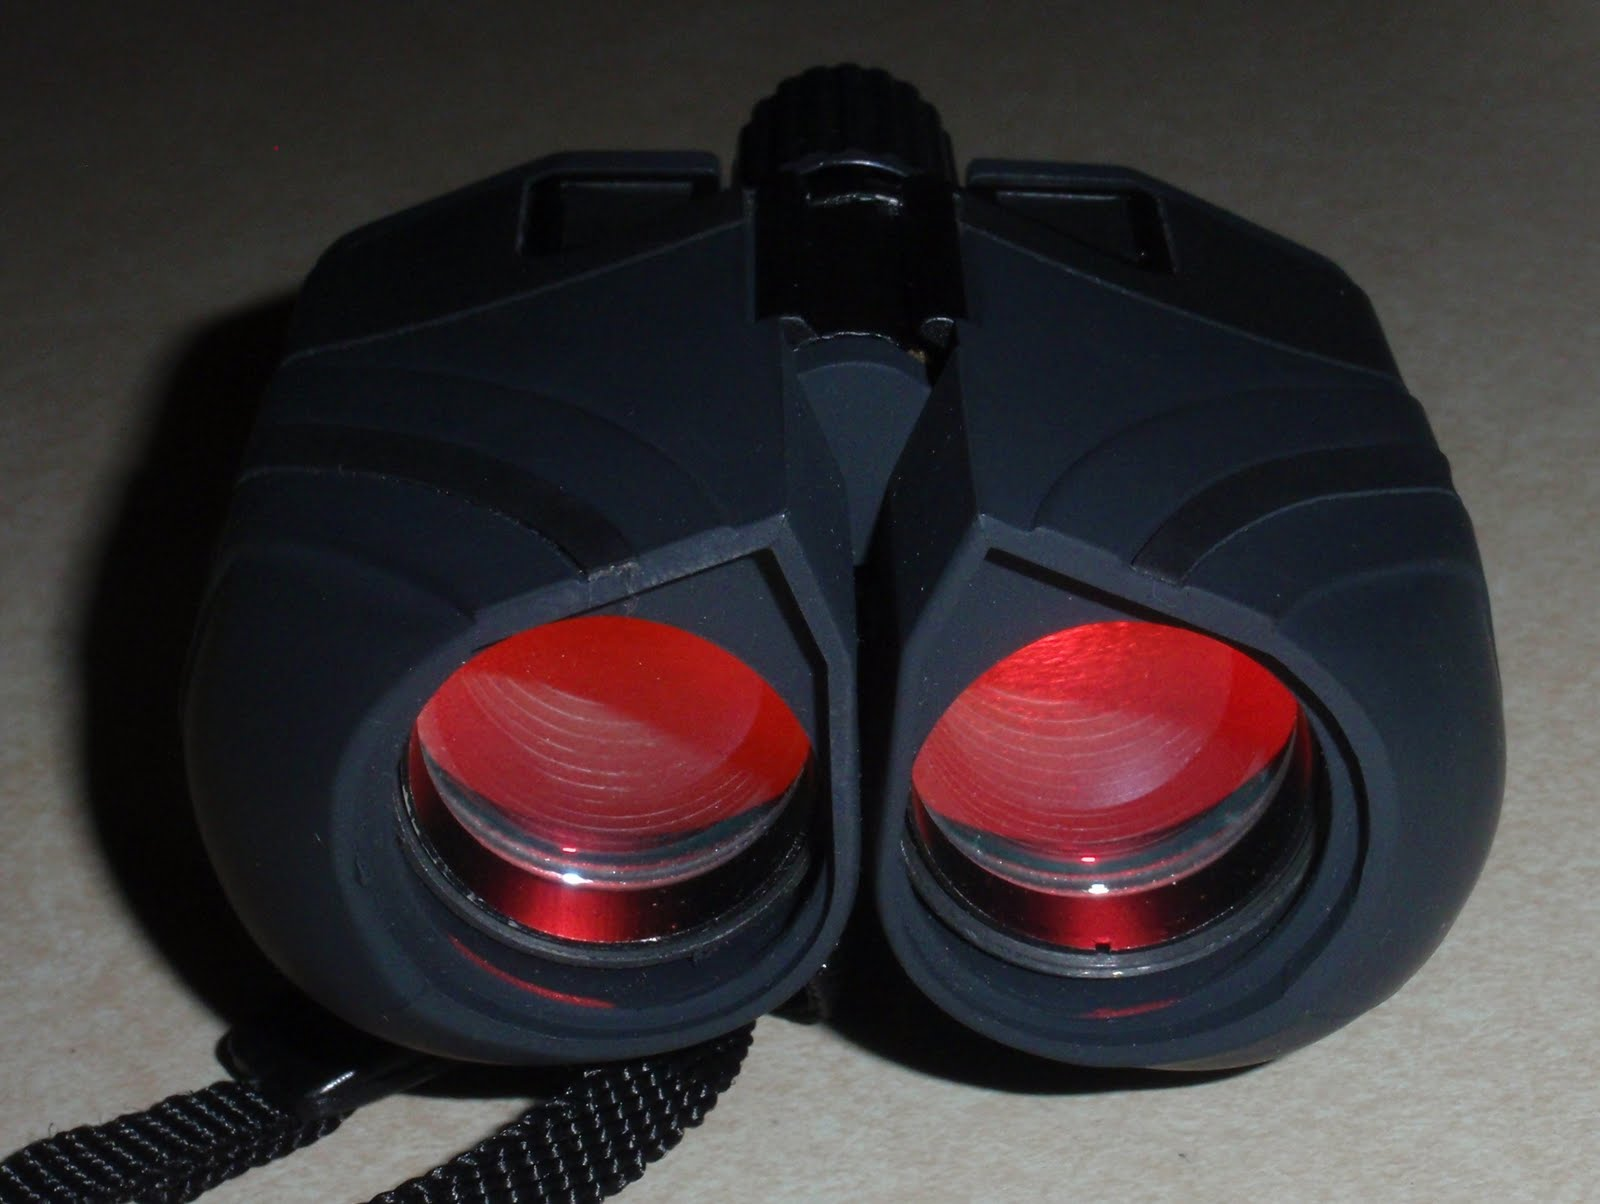 Internet Superstores 10x25mm Binoculars By Tasco Lumina W